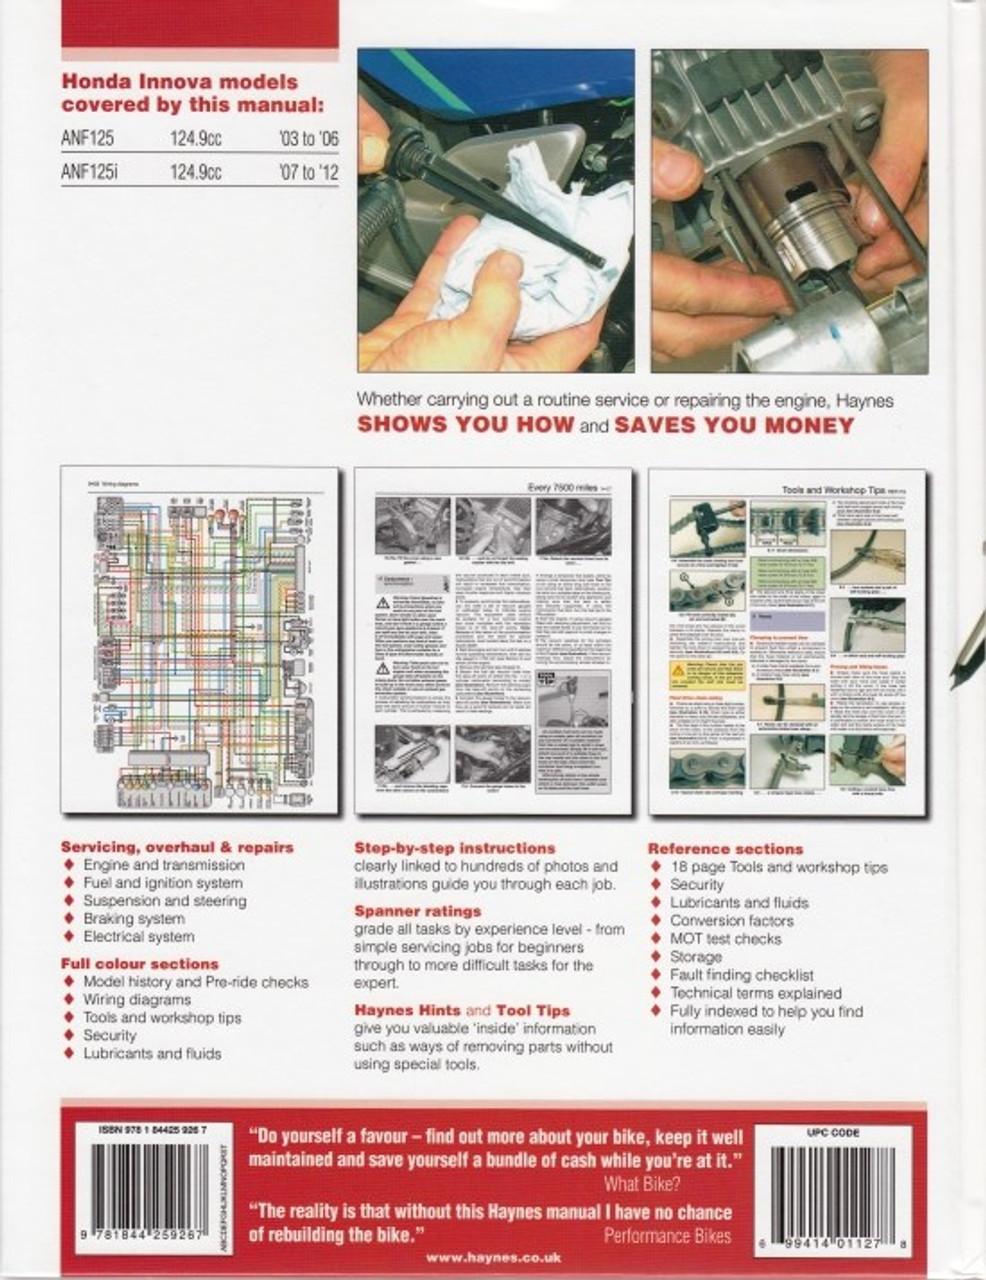 Honda Anf125 Anf125i Innova Scooter 2003 2012 Workshop Manual